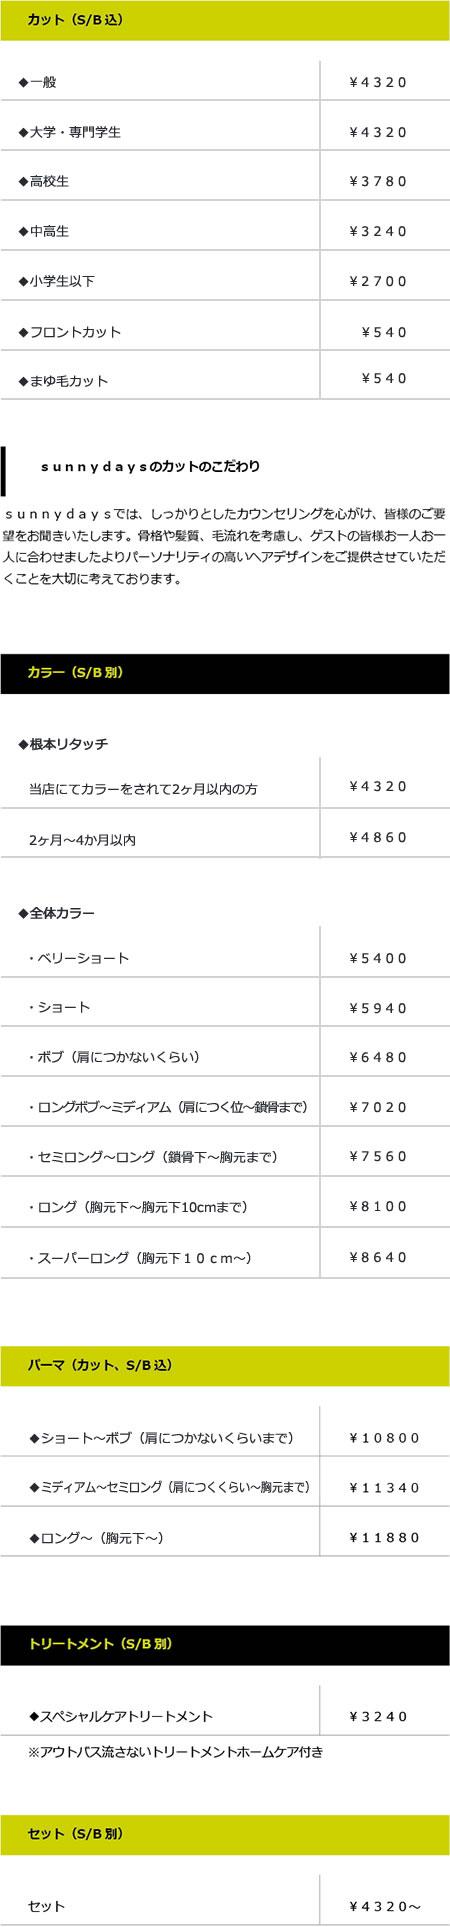 price_r_02